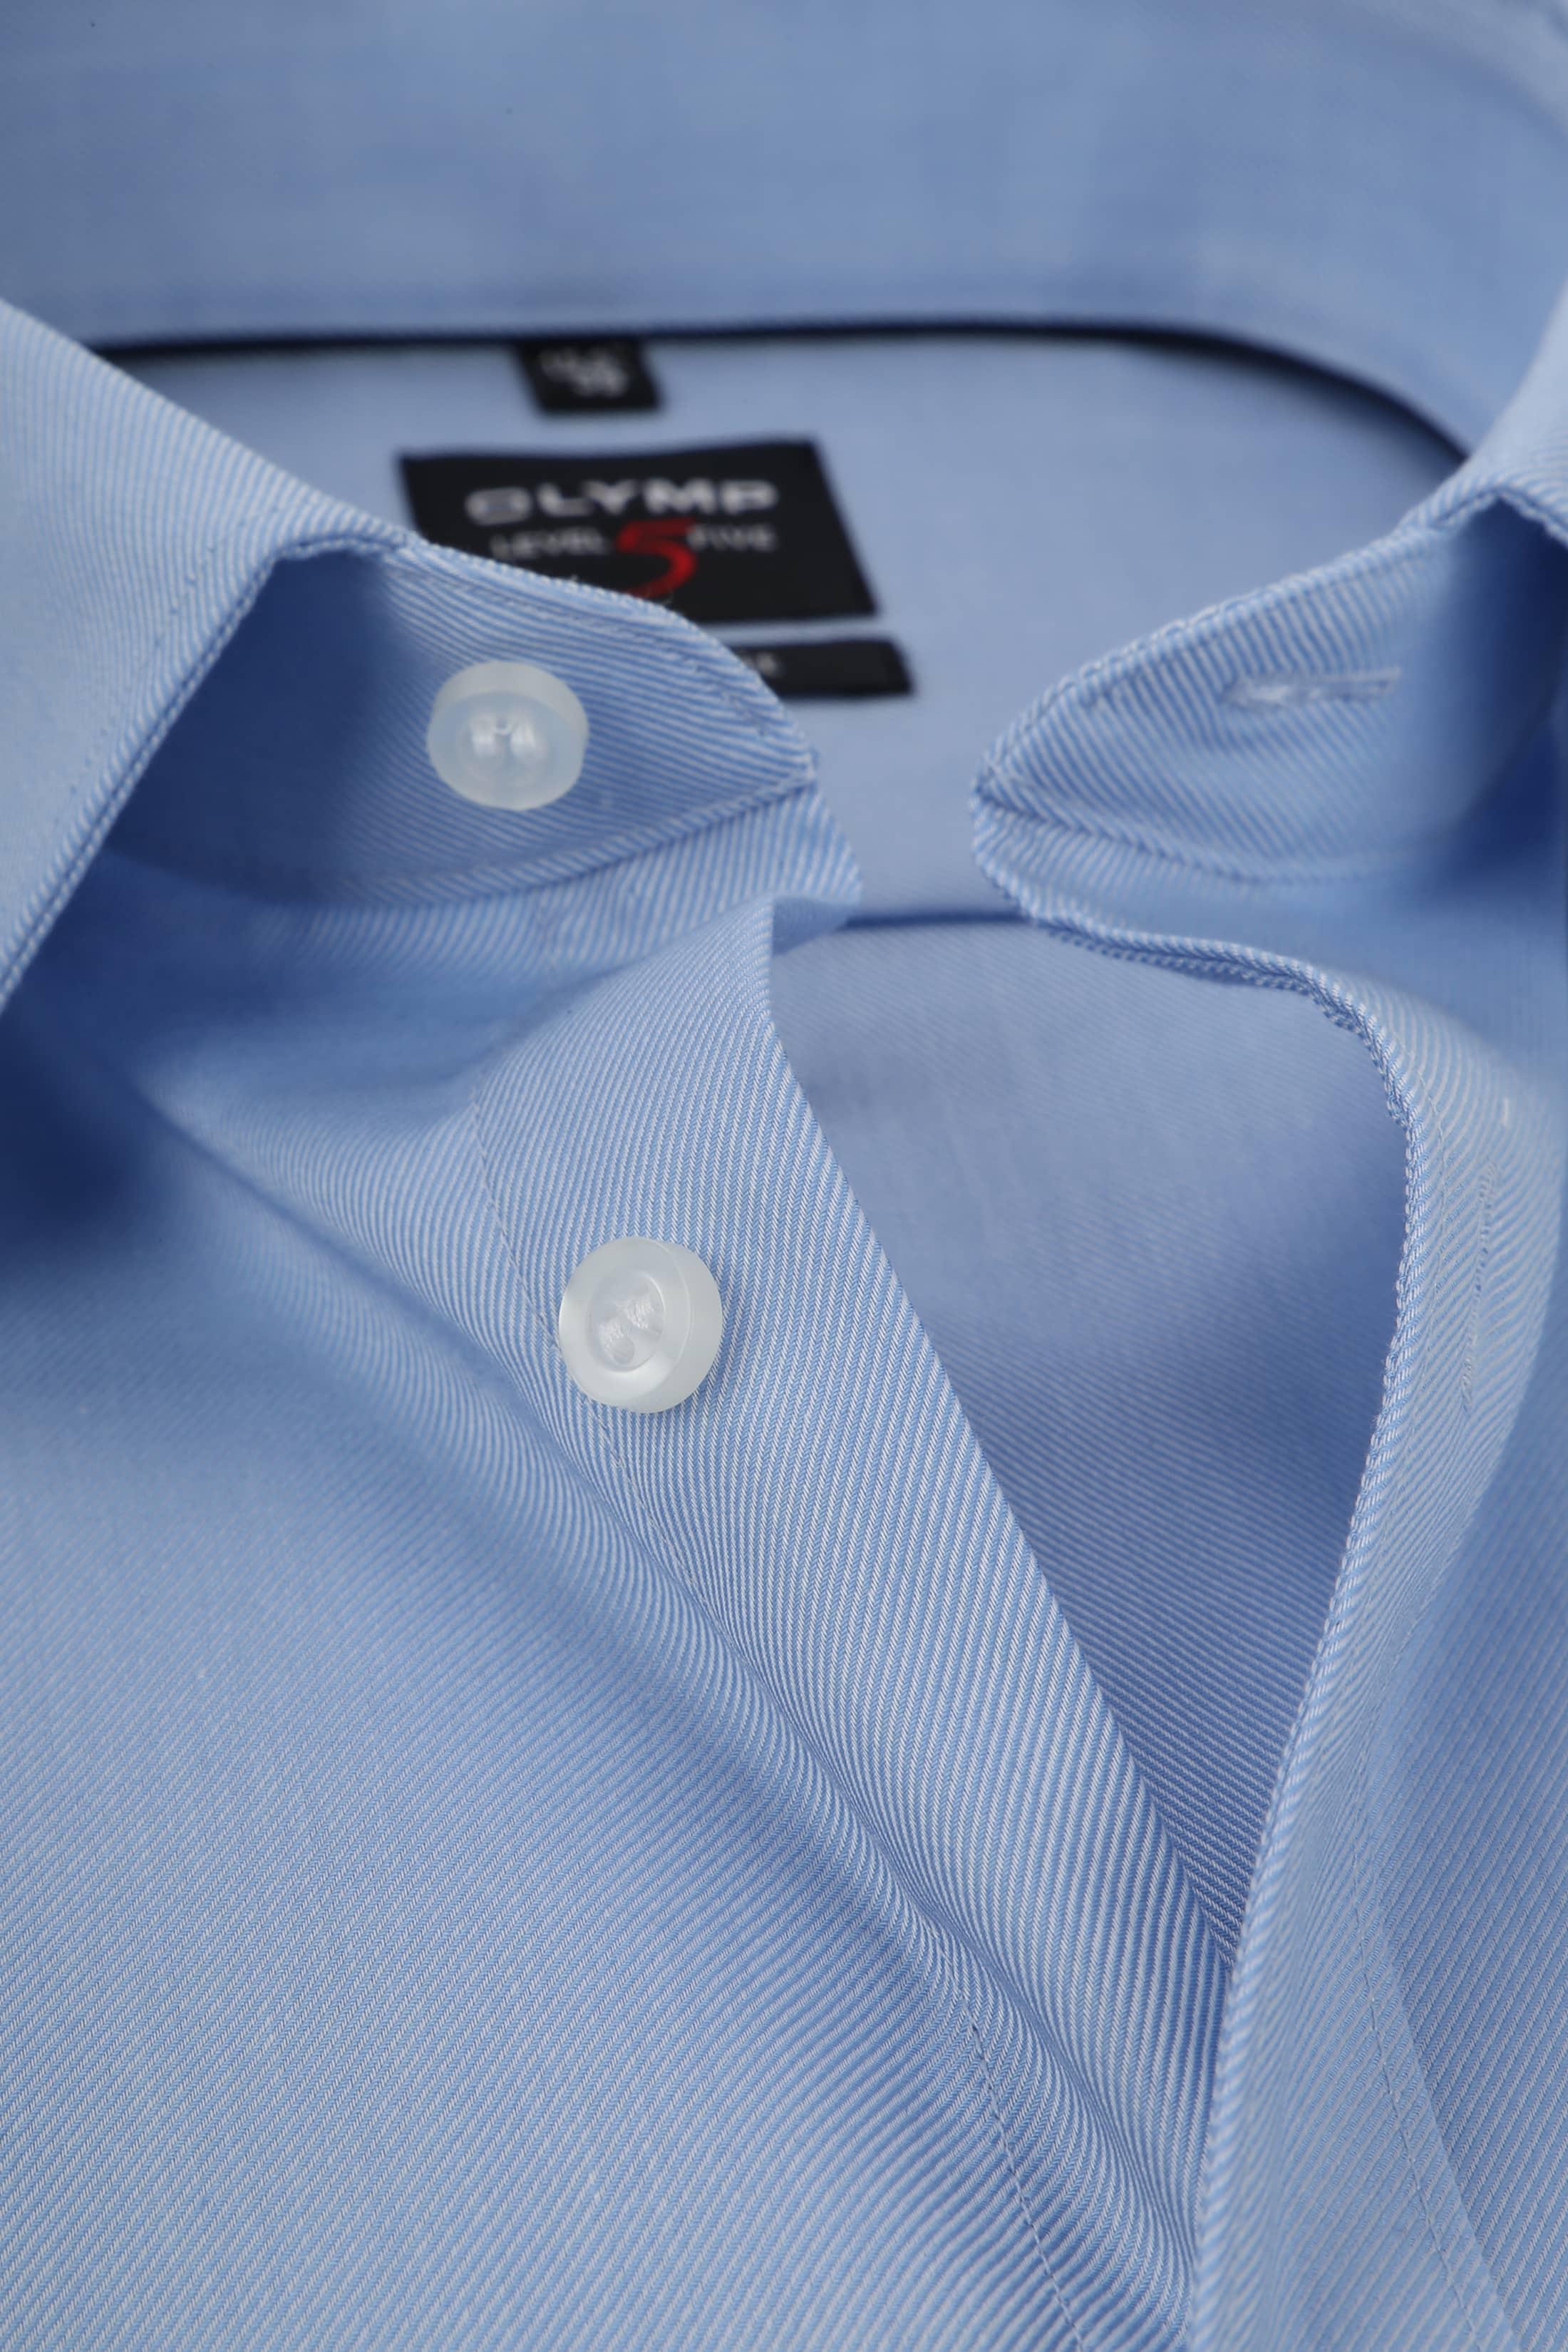 OLYMP Overhemd Level 5 Twill Blauw foto 1